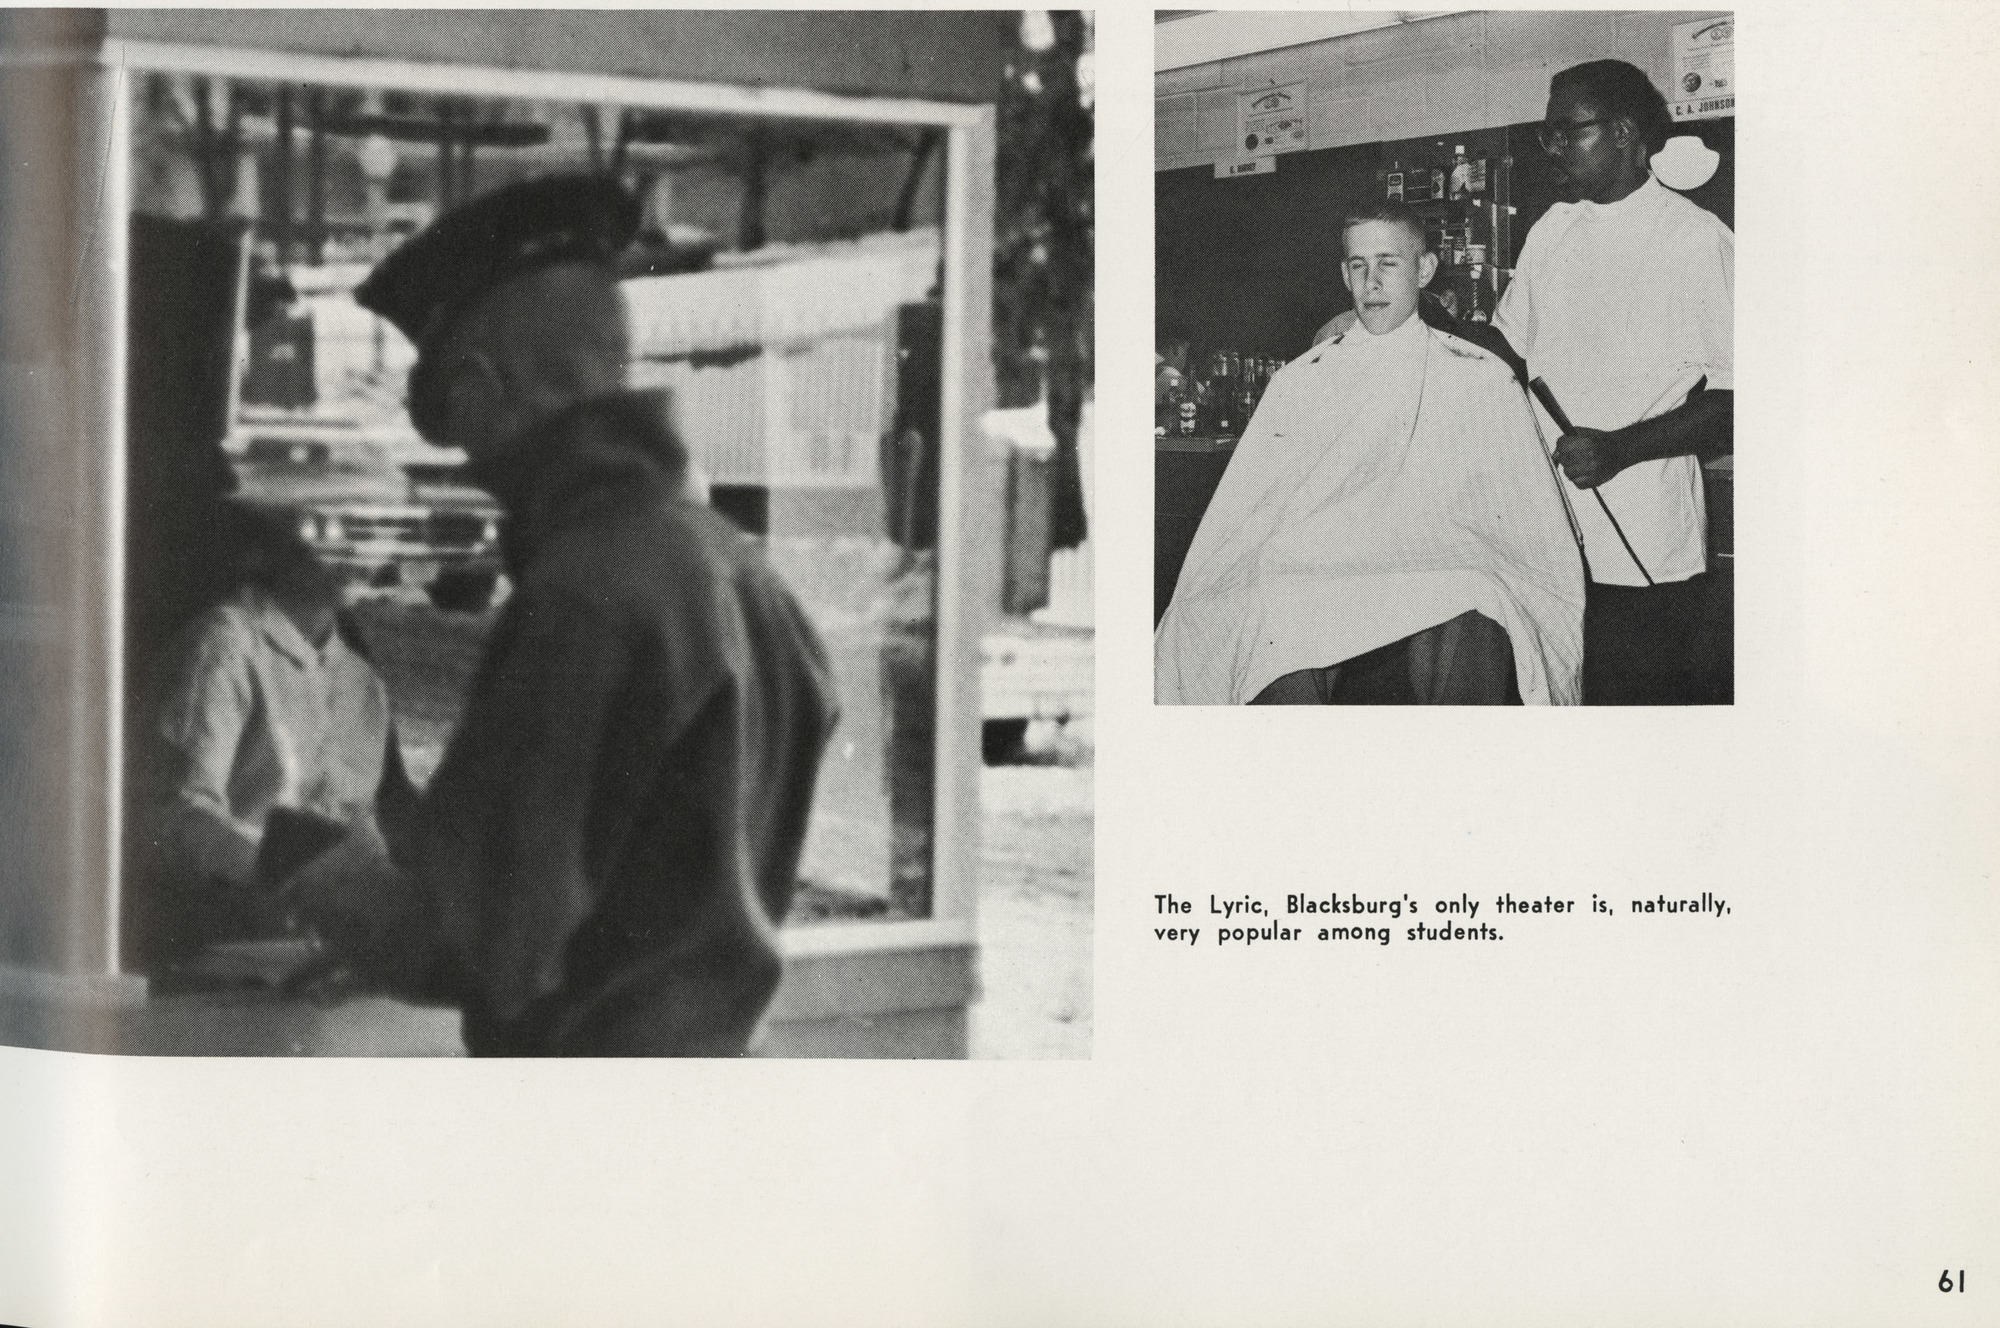 http://spec.lib.vt.edu/pickup/Omeka_upload/Bugle1966_pg61_Barbers.jpg